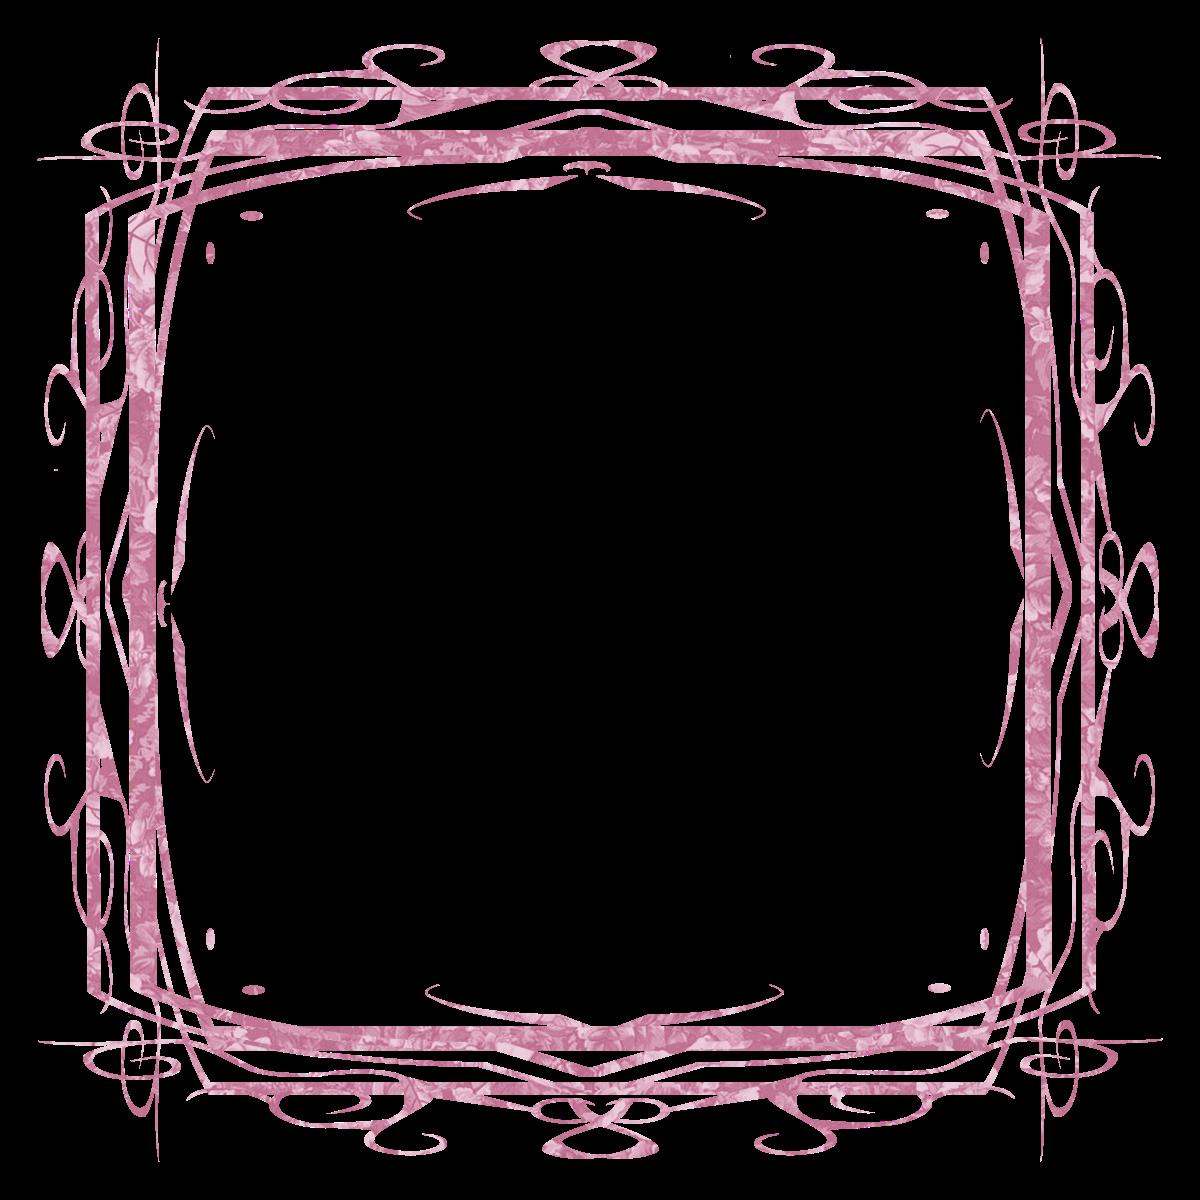 scrapbook borders and frames